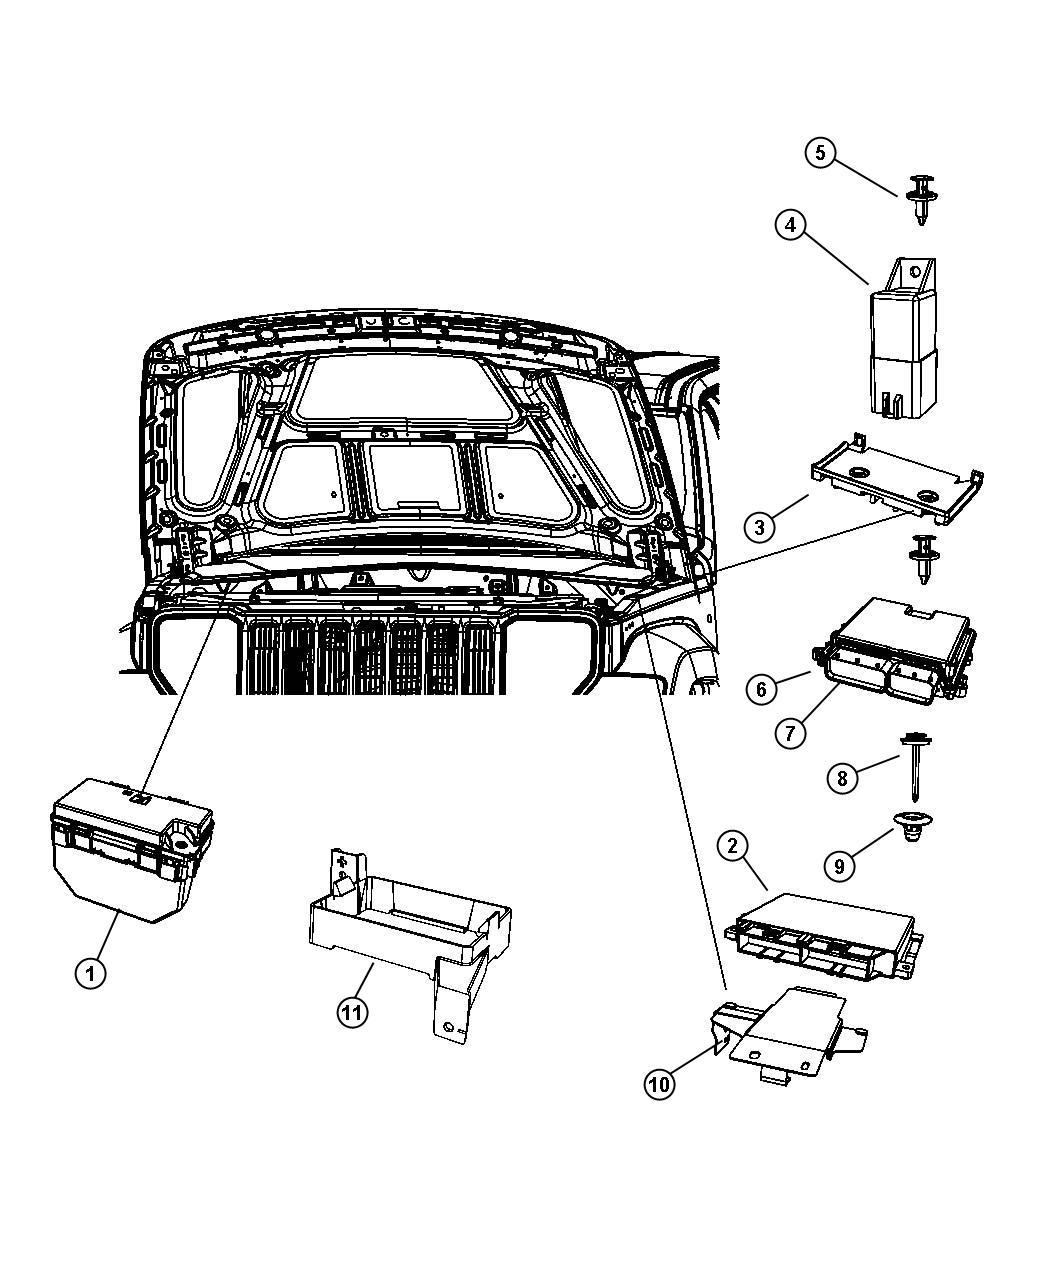 Jeep Liberty Module Glow Plug Modules Compartment